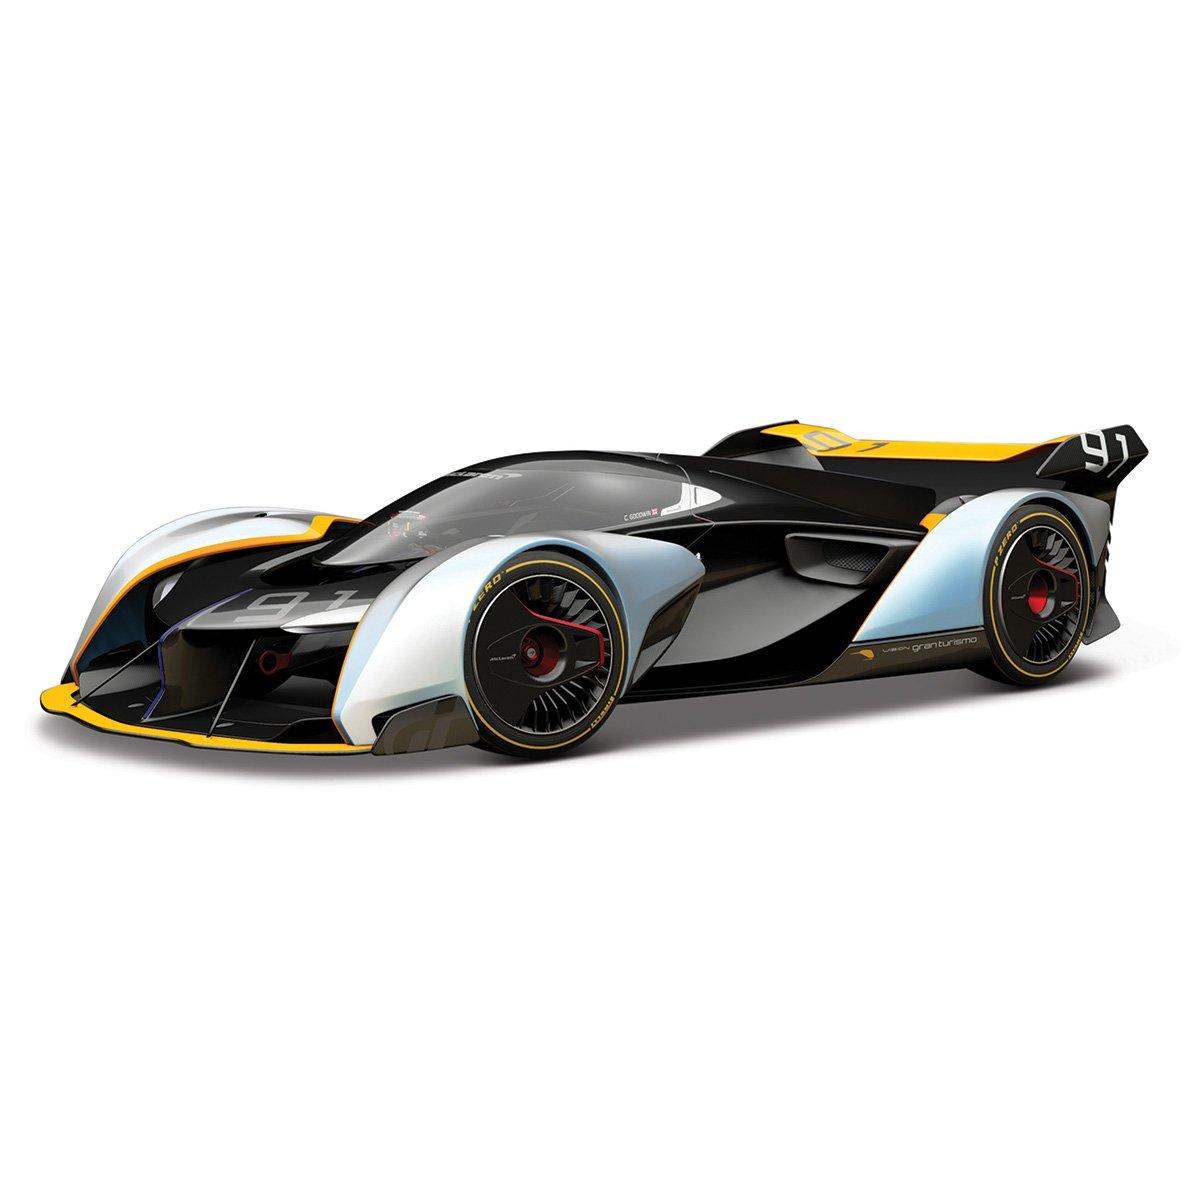 Masinuta Maisto McLaren Gran Turismo, 1:32, Negru